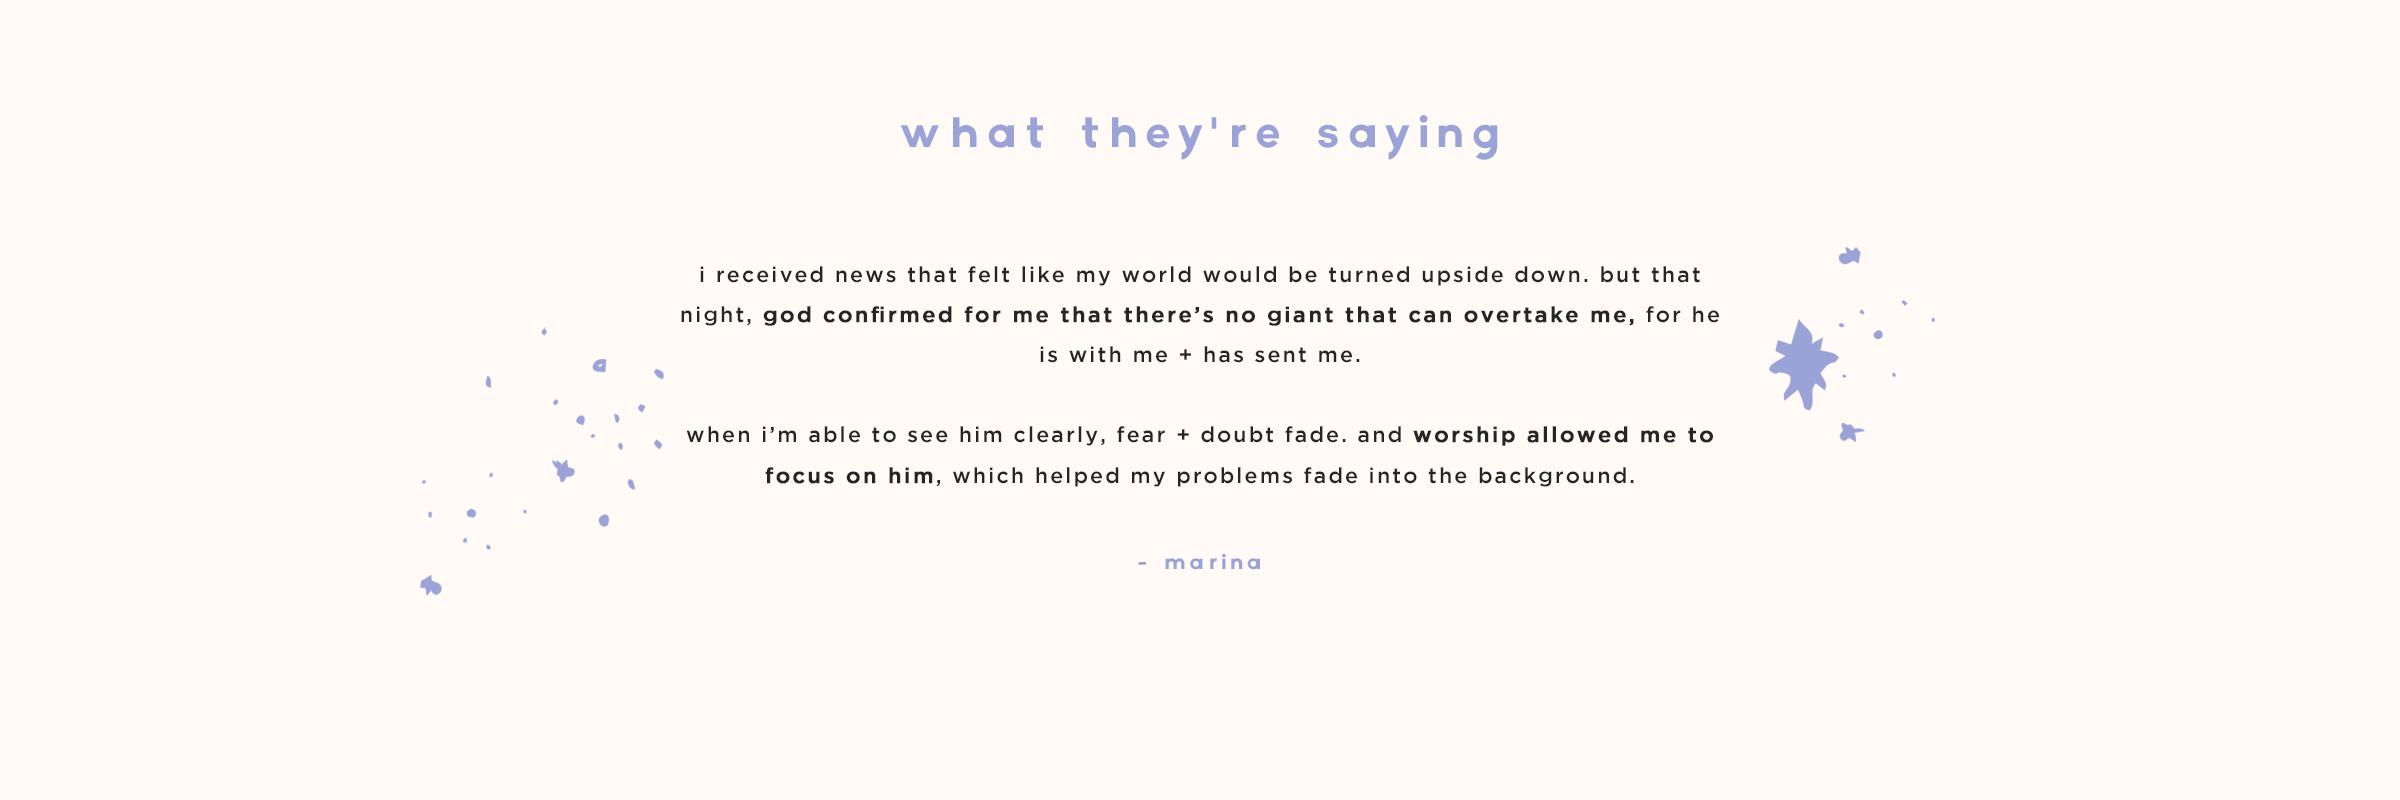 even-vanity-ends-dwell-worship-night-testimony-2.jpg